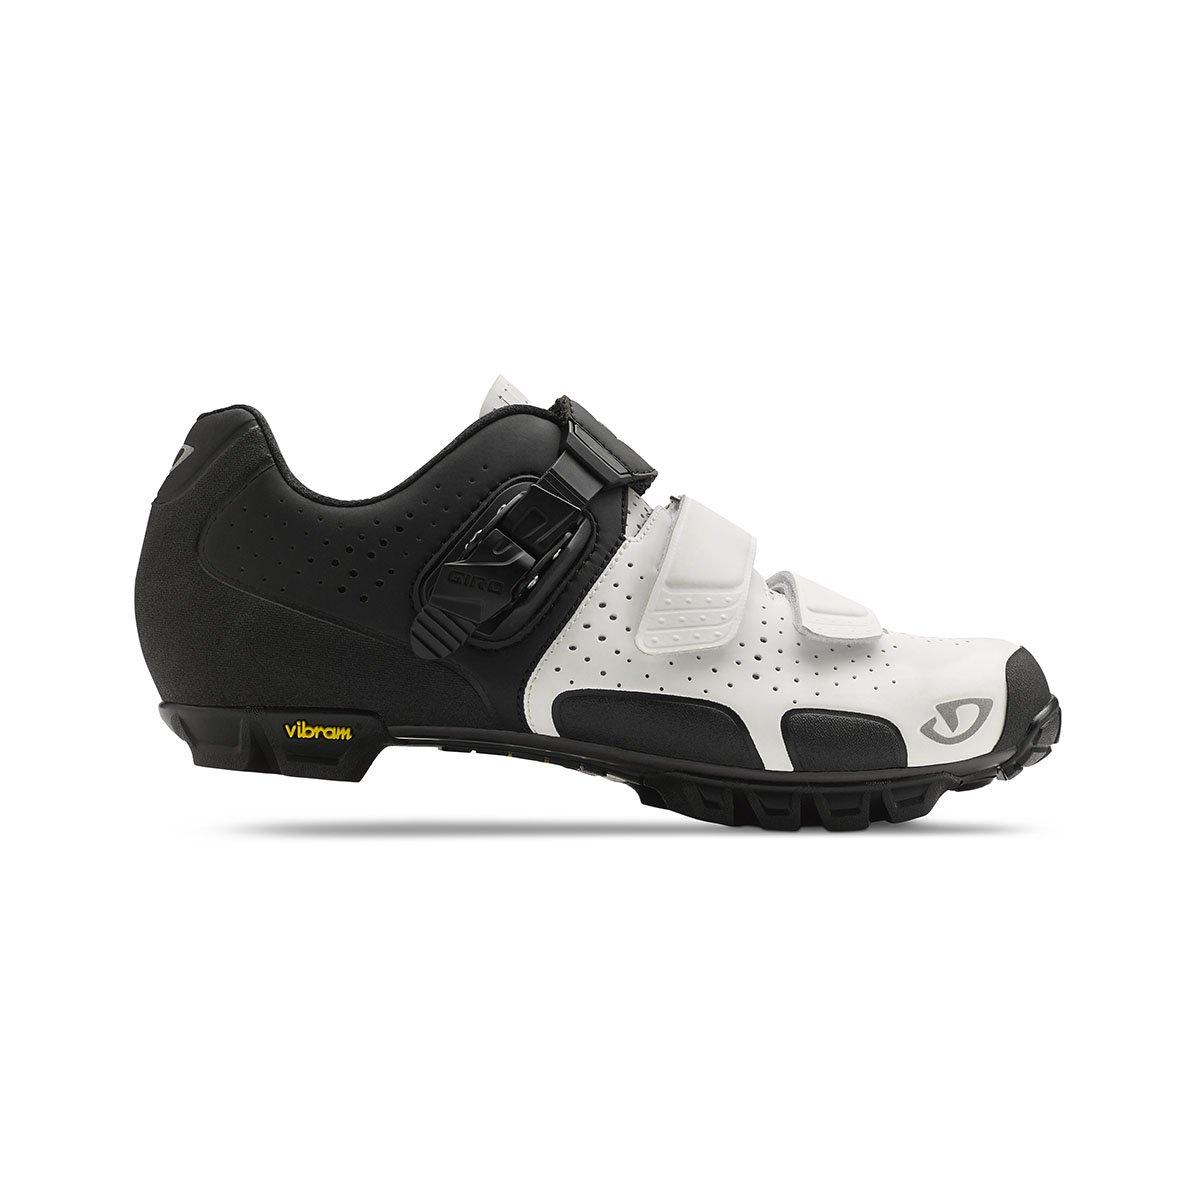 Giro SICA VR70 schuhe damen damen damen Weiß Matte schwarz 2016 Schuhe 6484e6